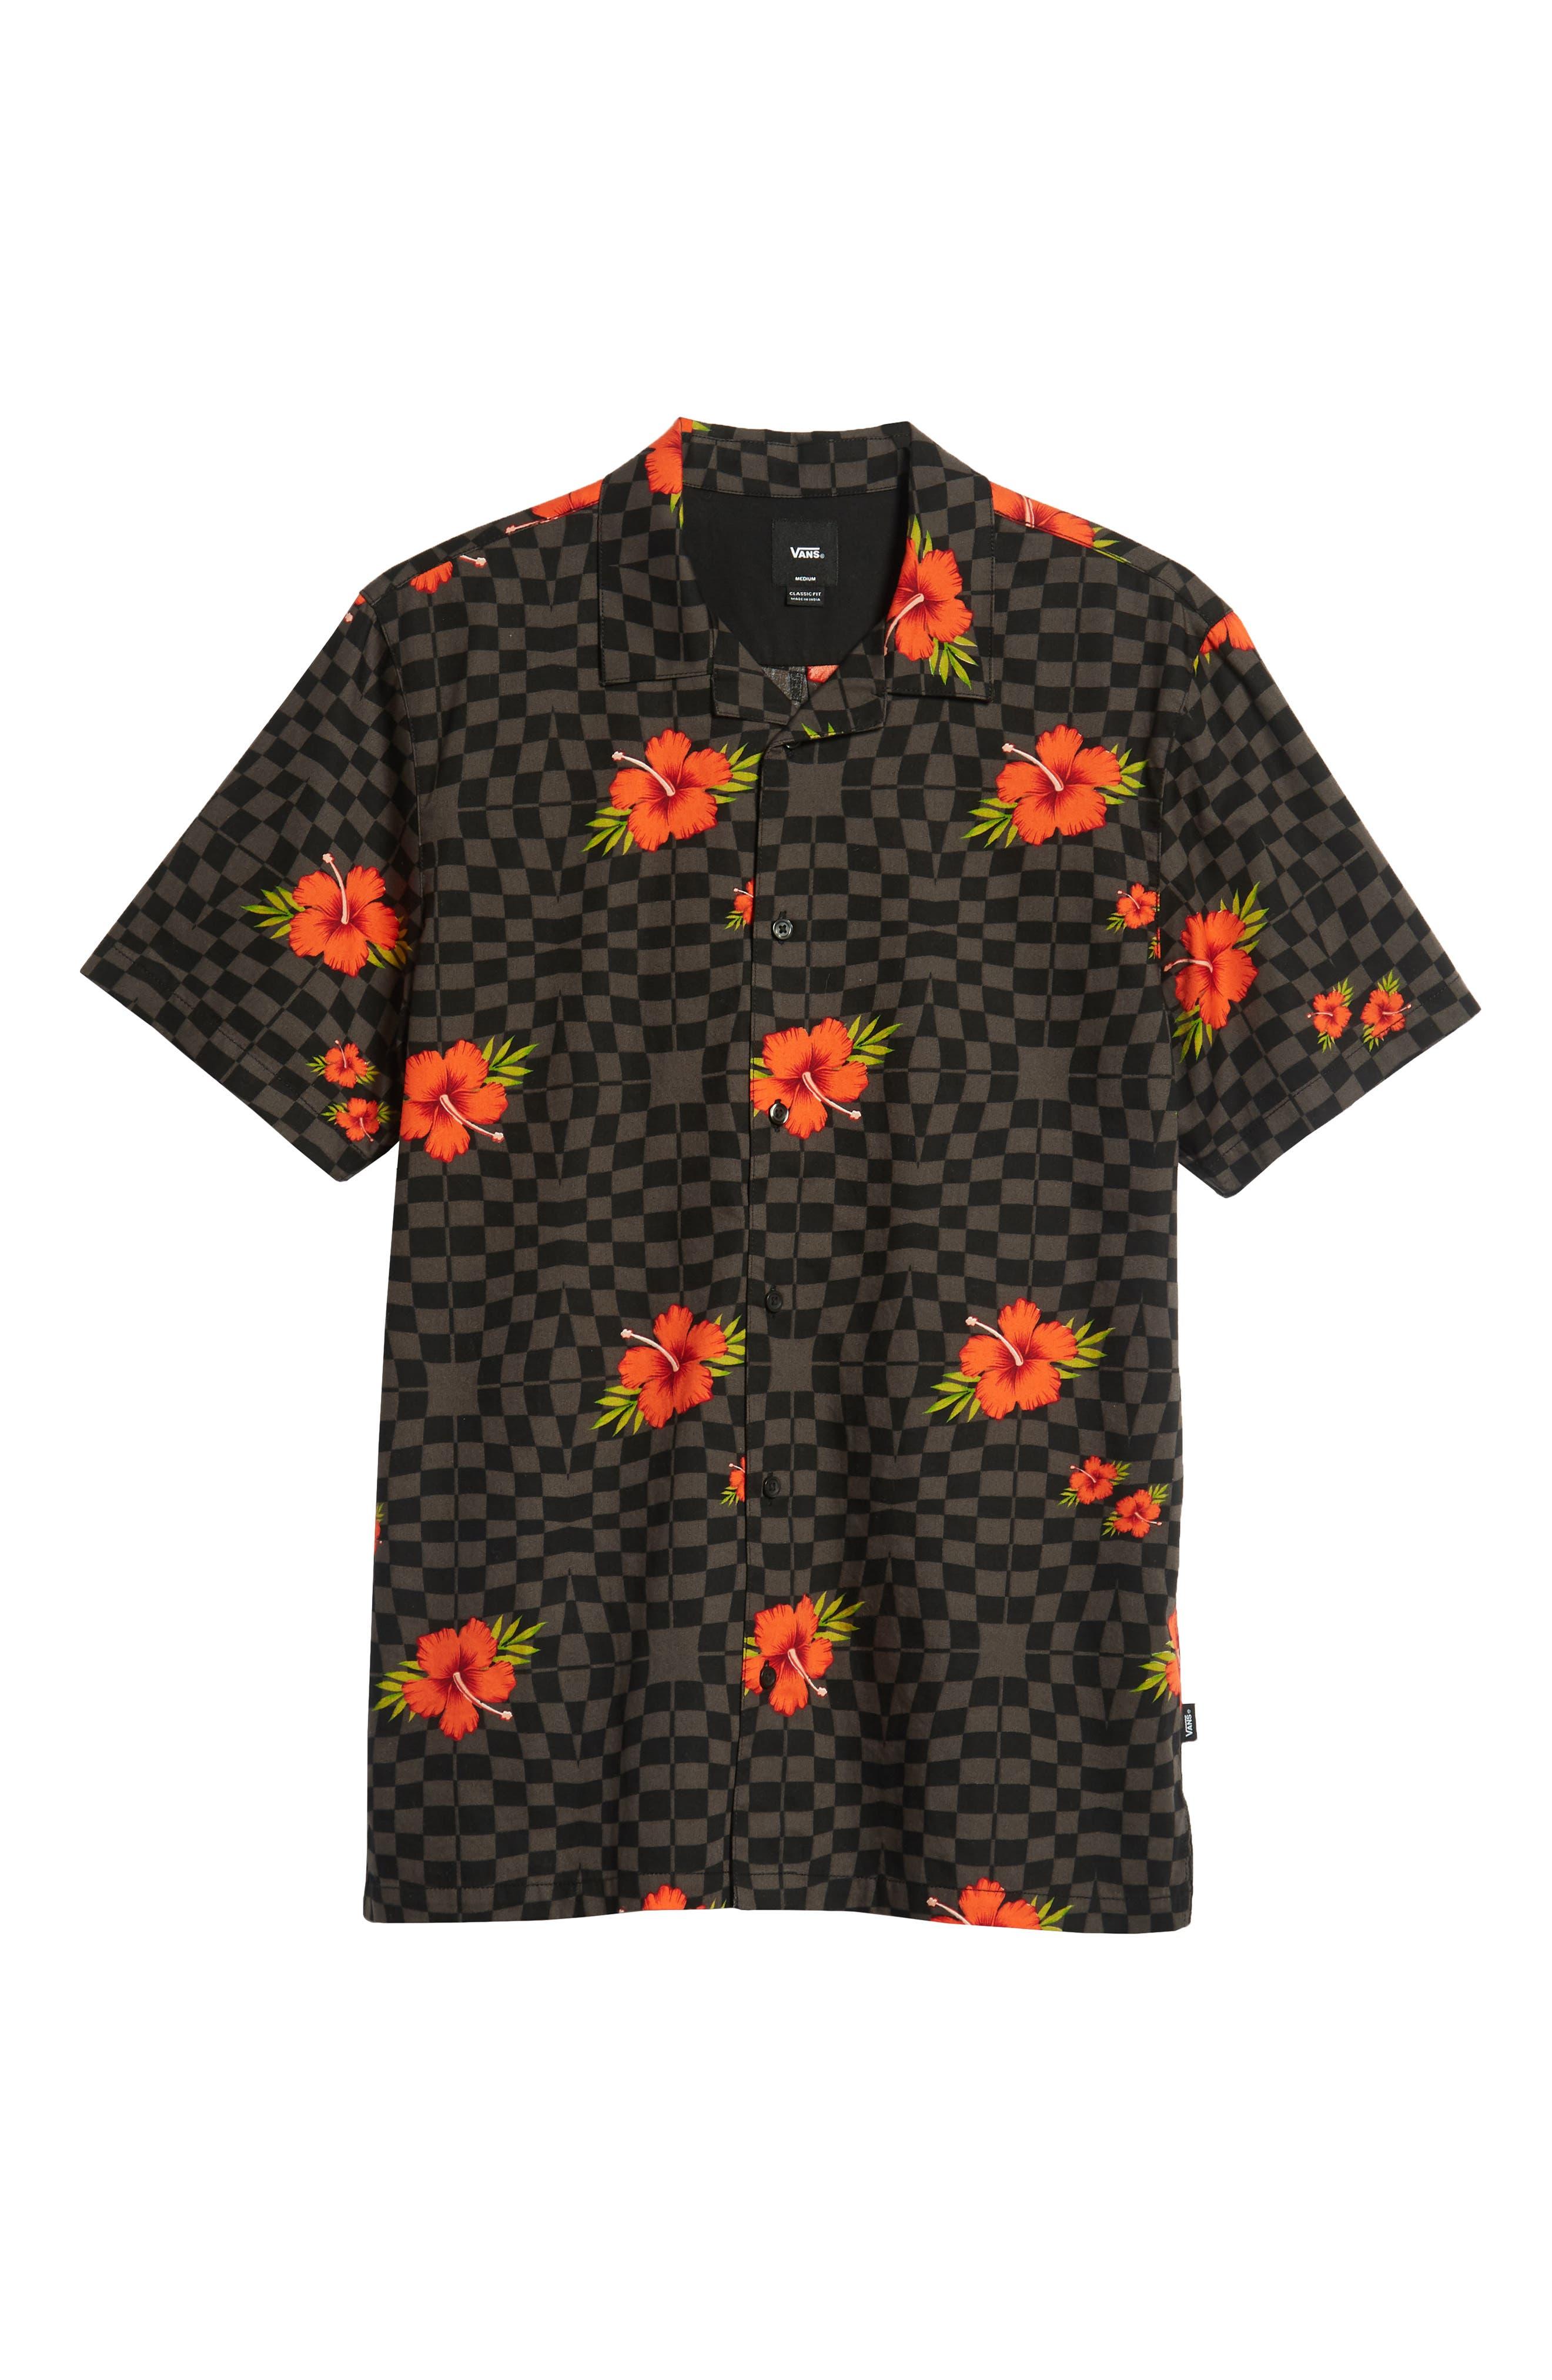 VANS,                             Warp Tropic Checks Camp Shirt,                             Alternate thumbnail 6, color,                             001